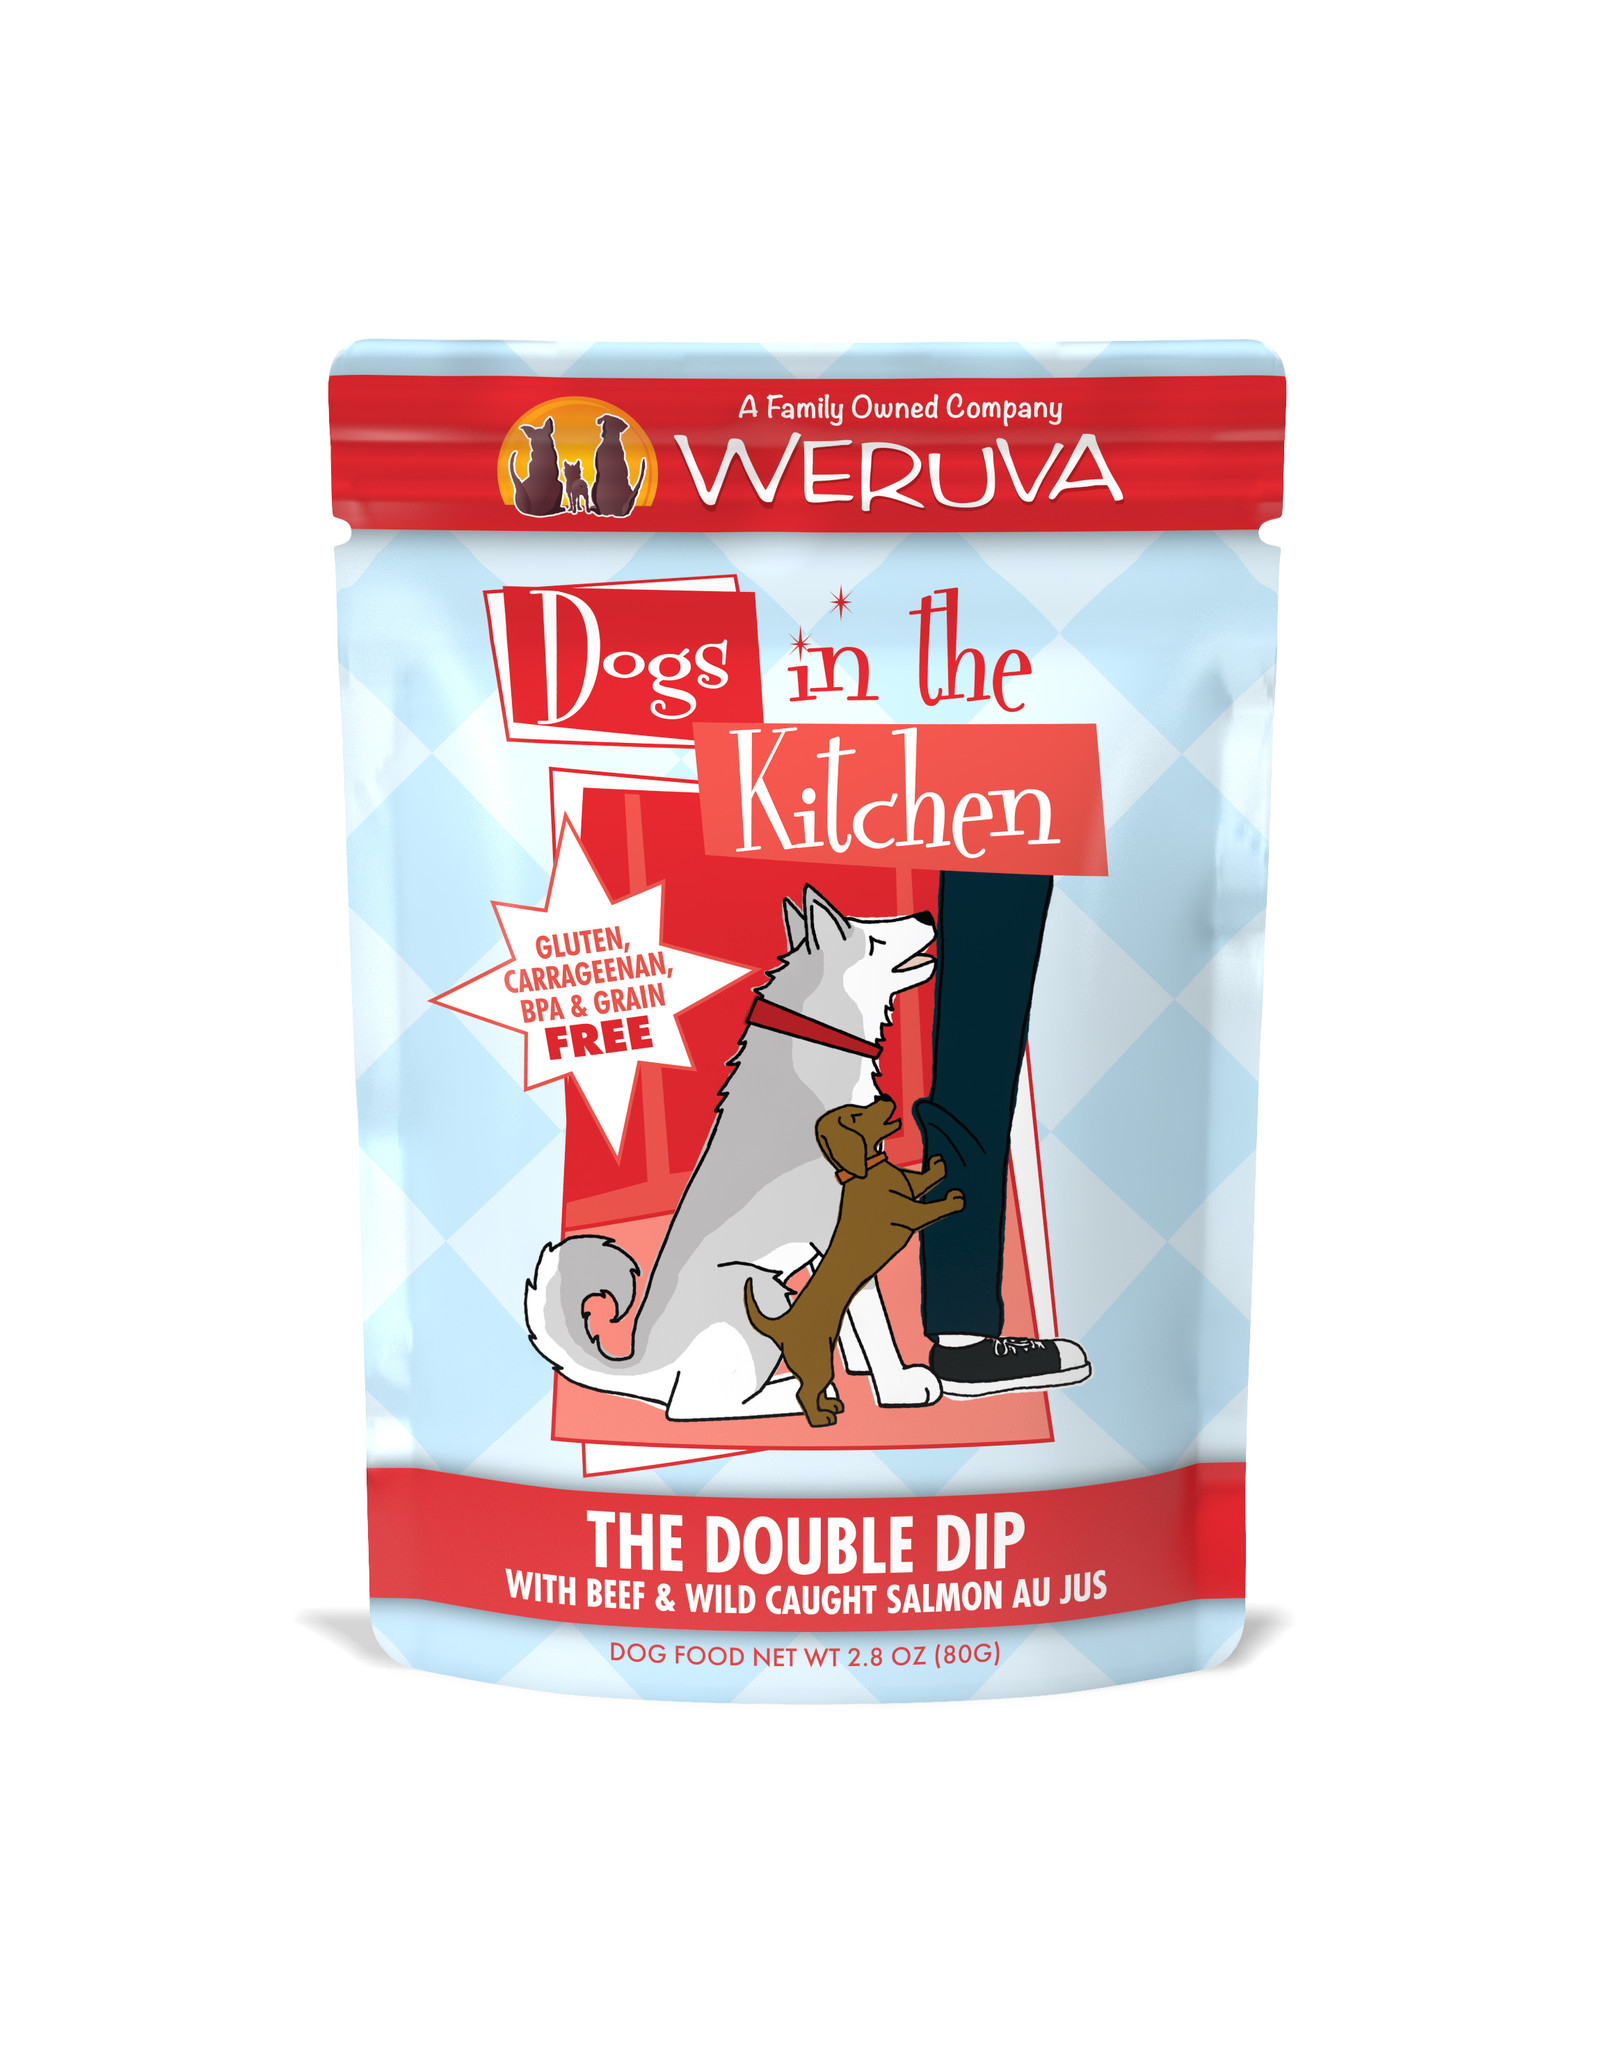 Weruva WERUVA DOG DOGS IN THE KITCHEN THE DOUBLE DIP WITH BEEF & WILD-CAUGHT SALMON AU JUS 2.8OZ